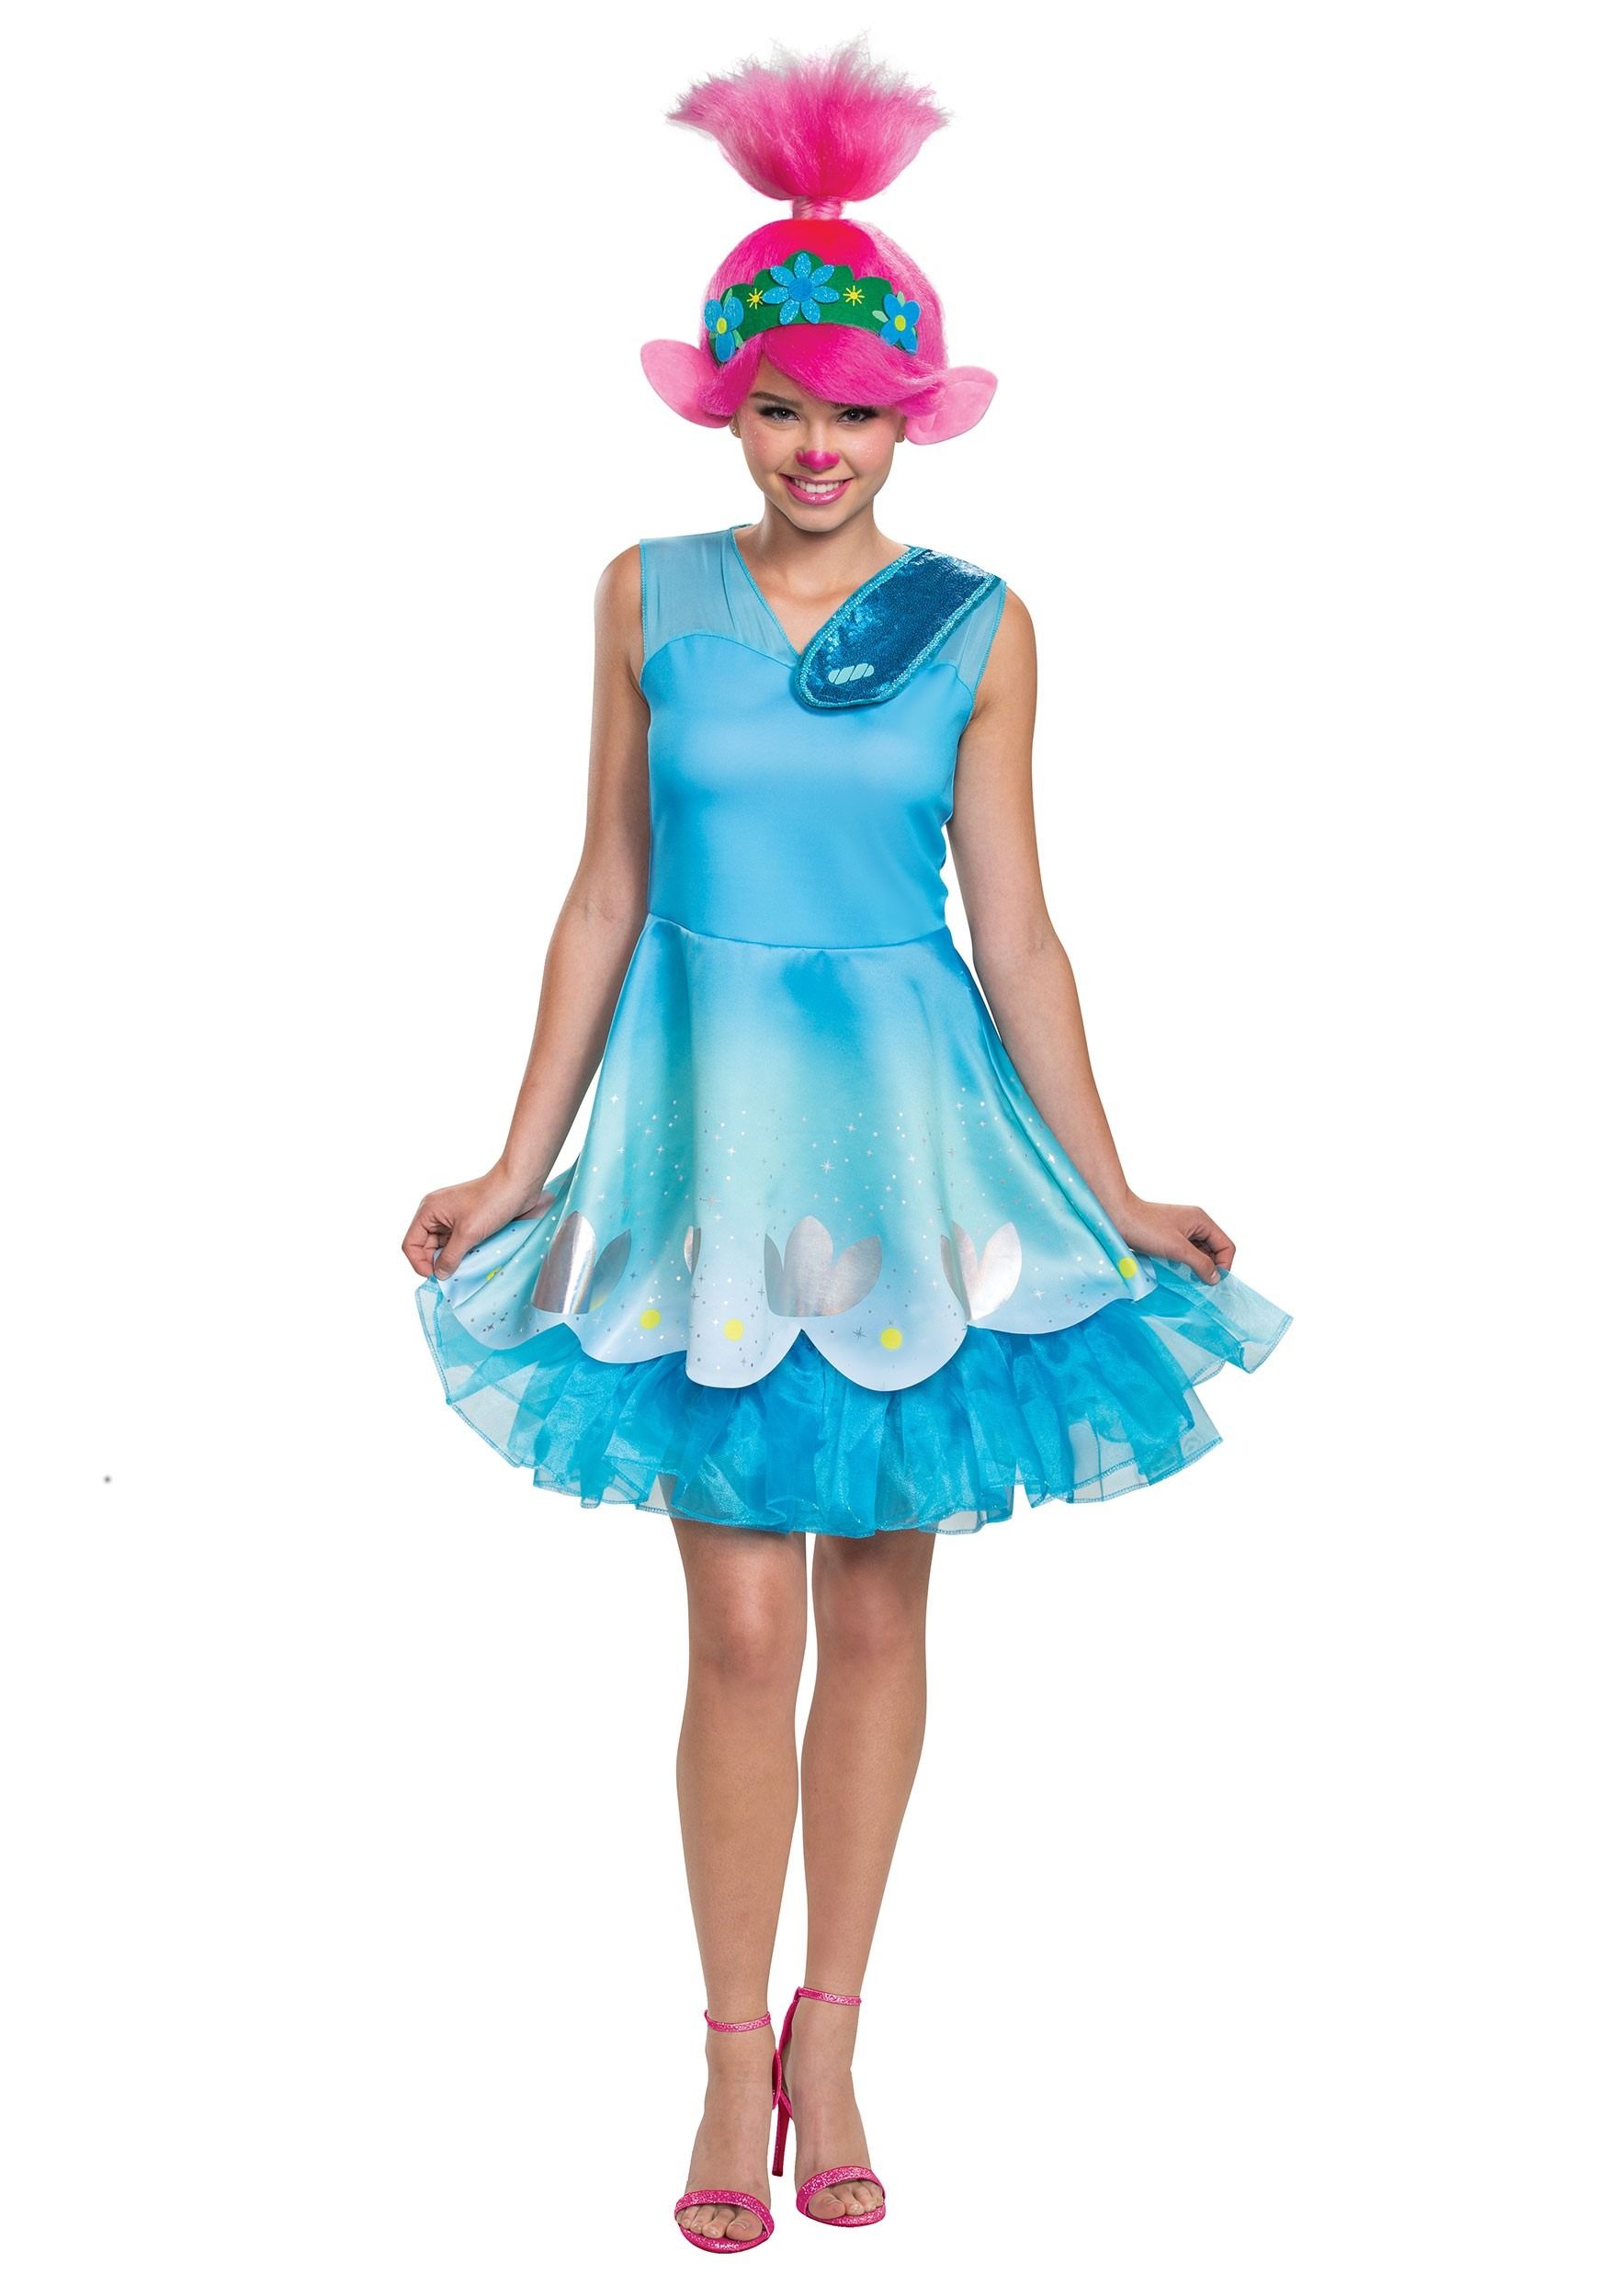 Women's Trolls World Tour Poppy Costume | Princess Poppy Halloween Costume